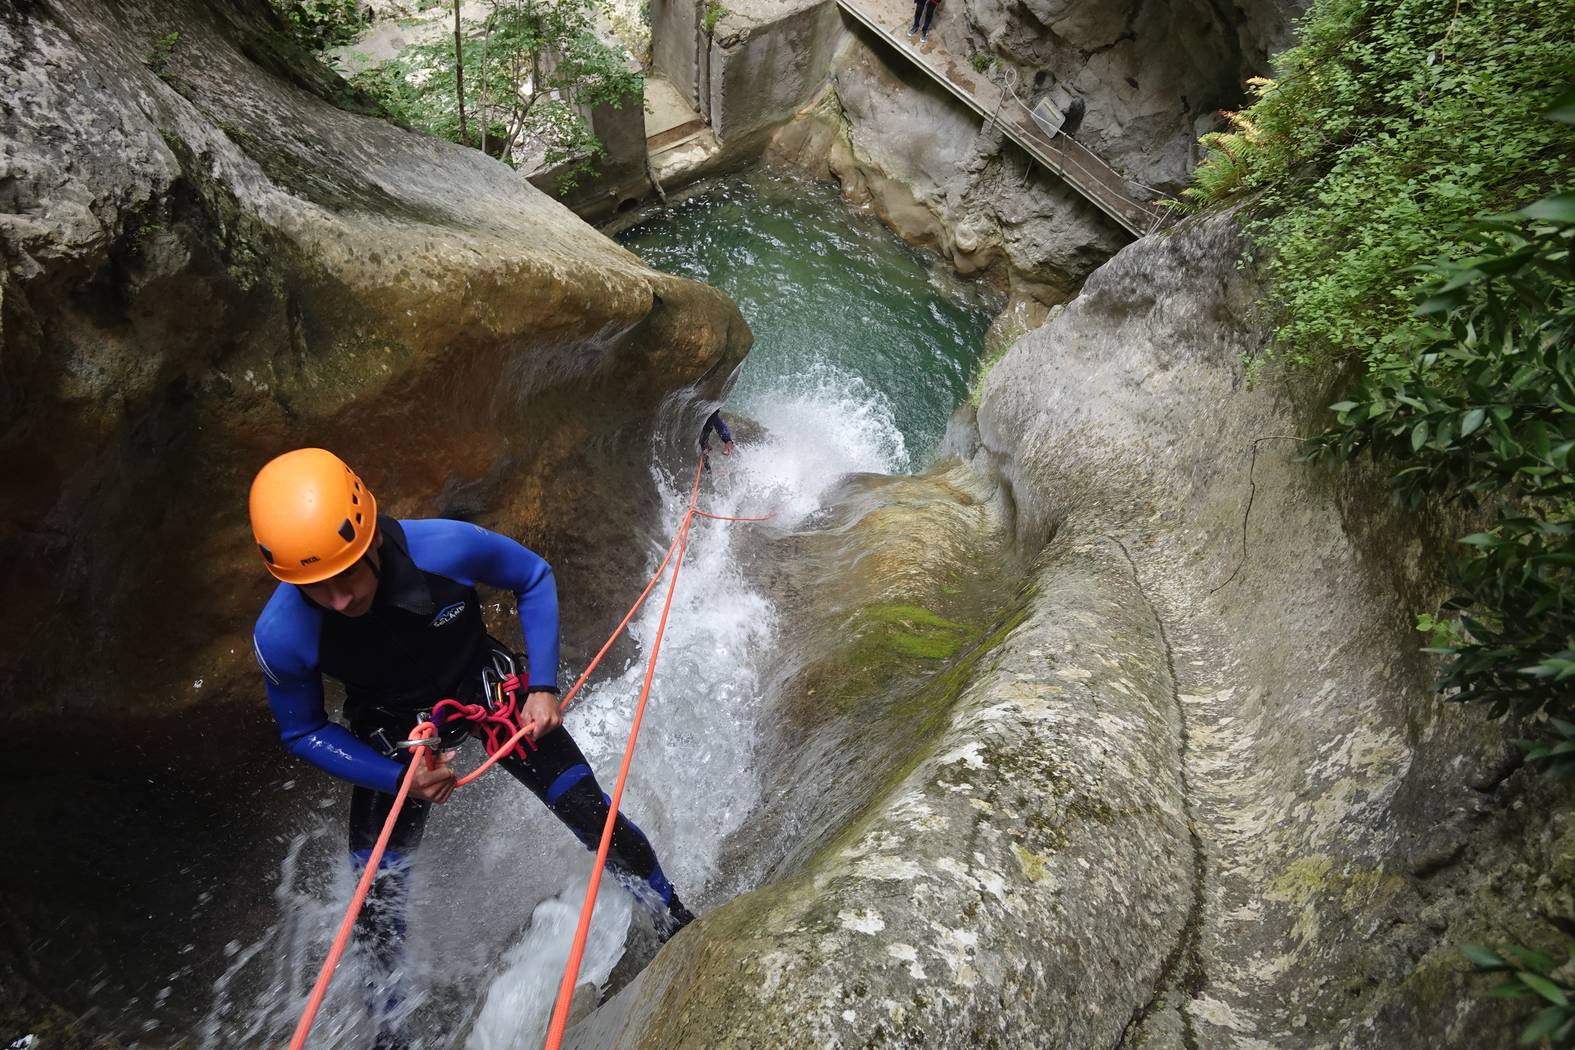 Canyoning Imberguet - Vesubie Valley